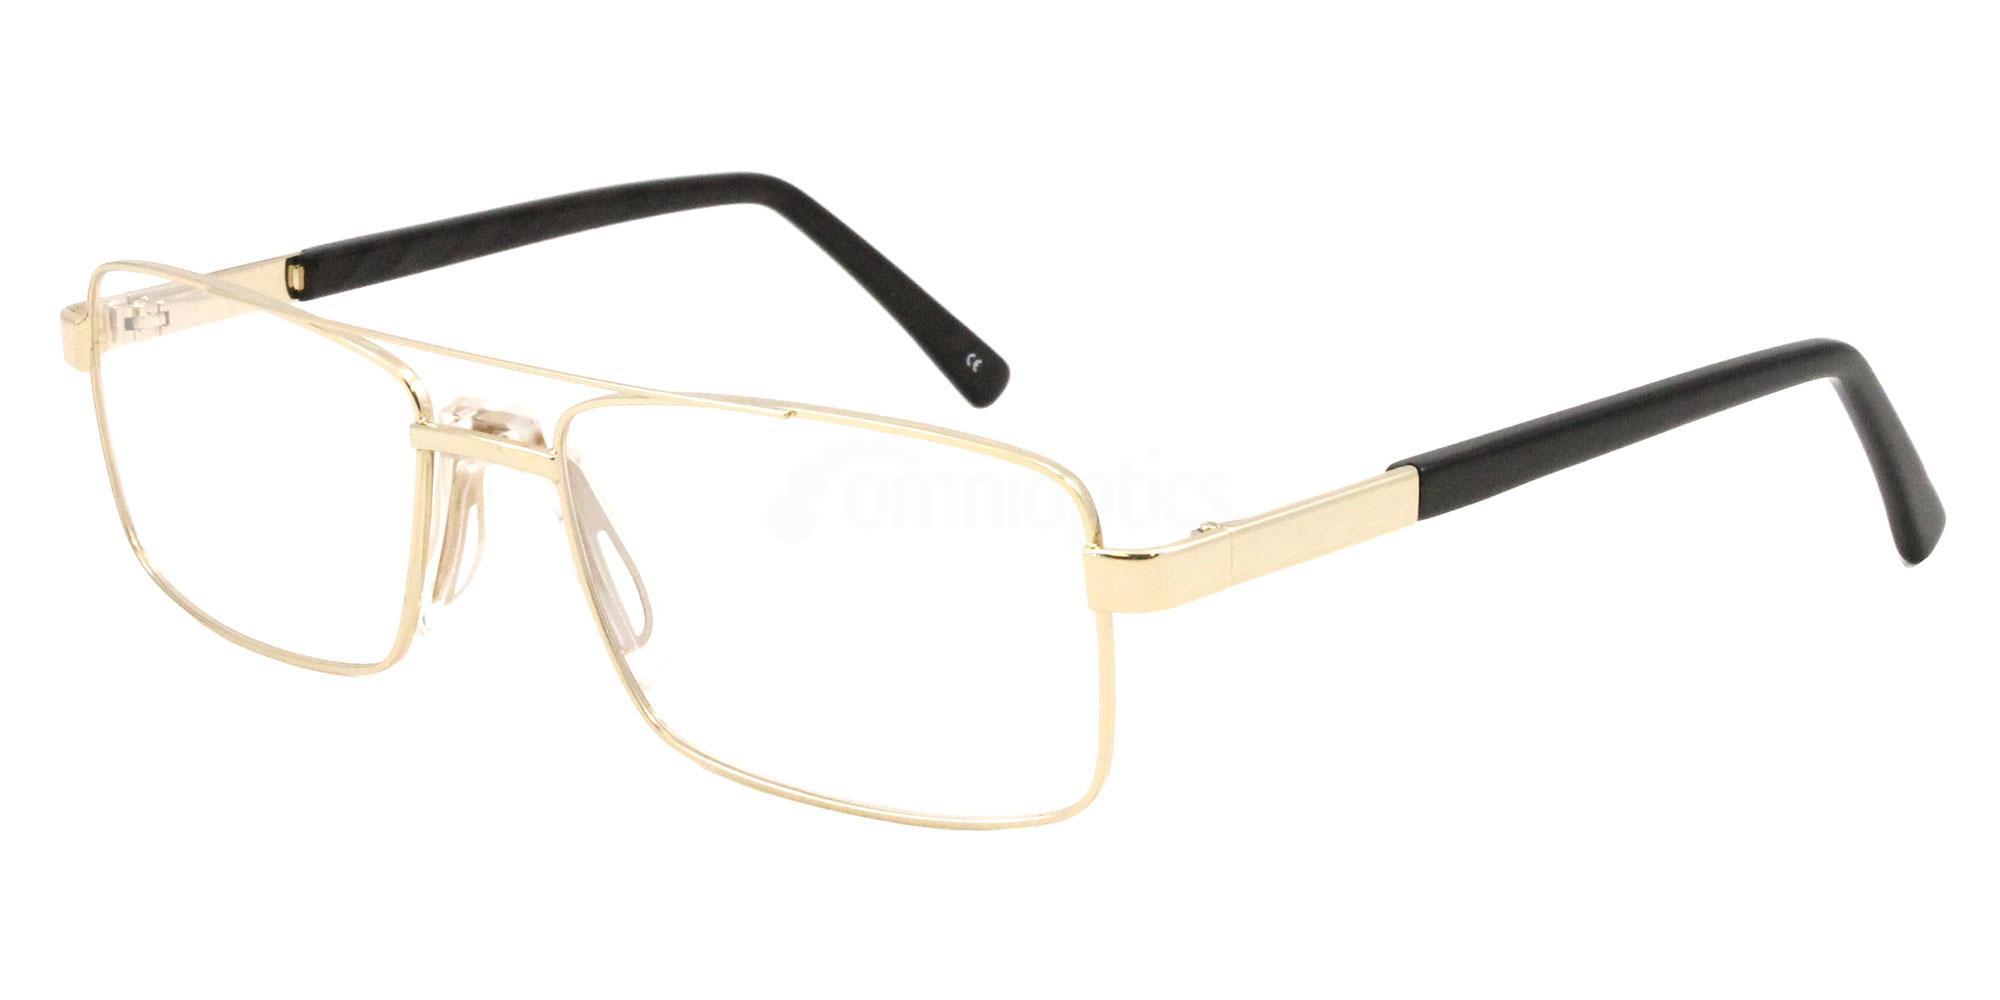 01 1795 Glasses, Mission